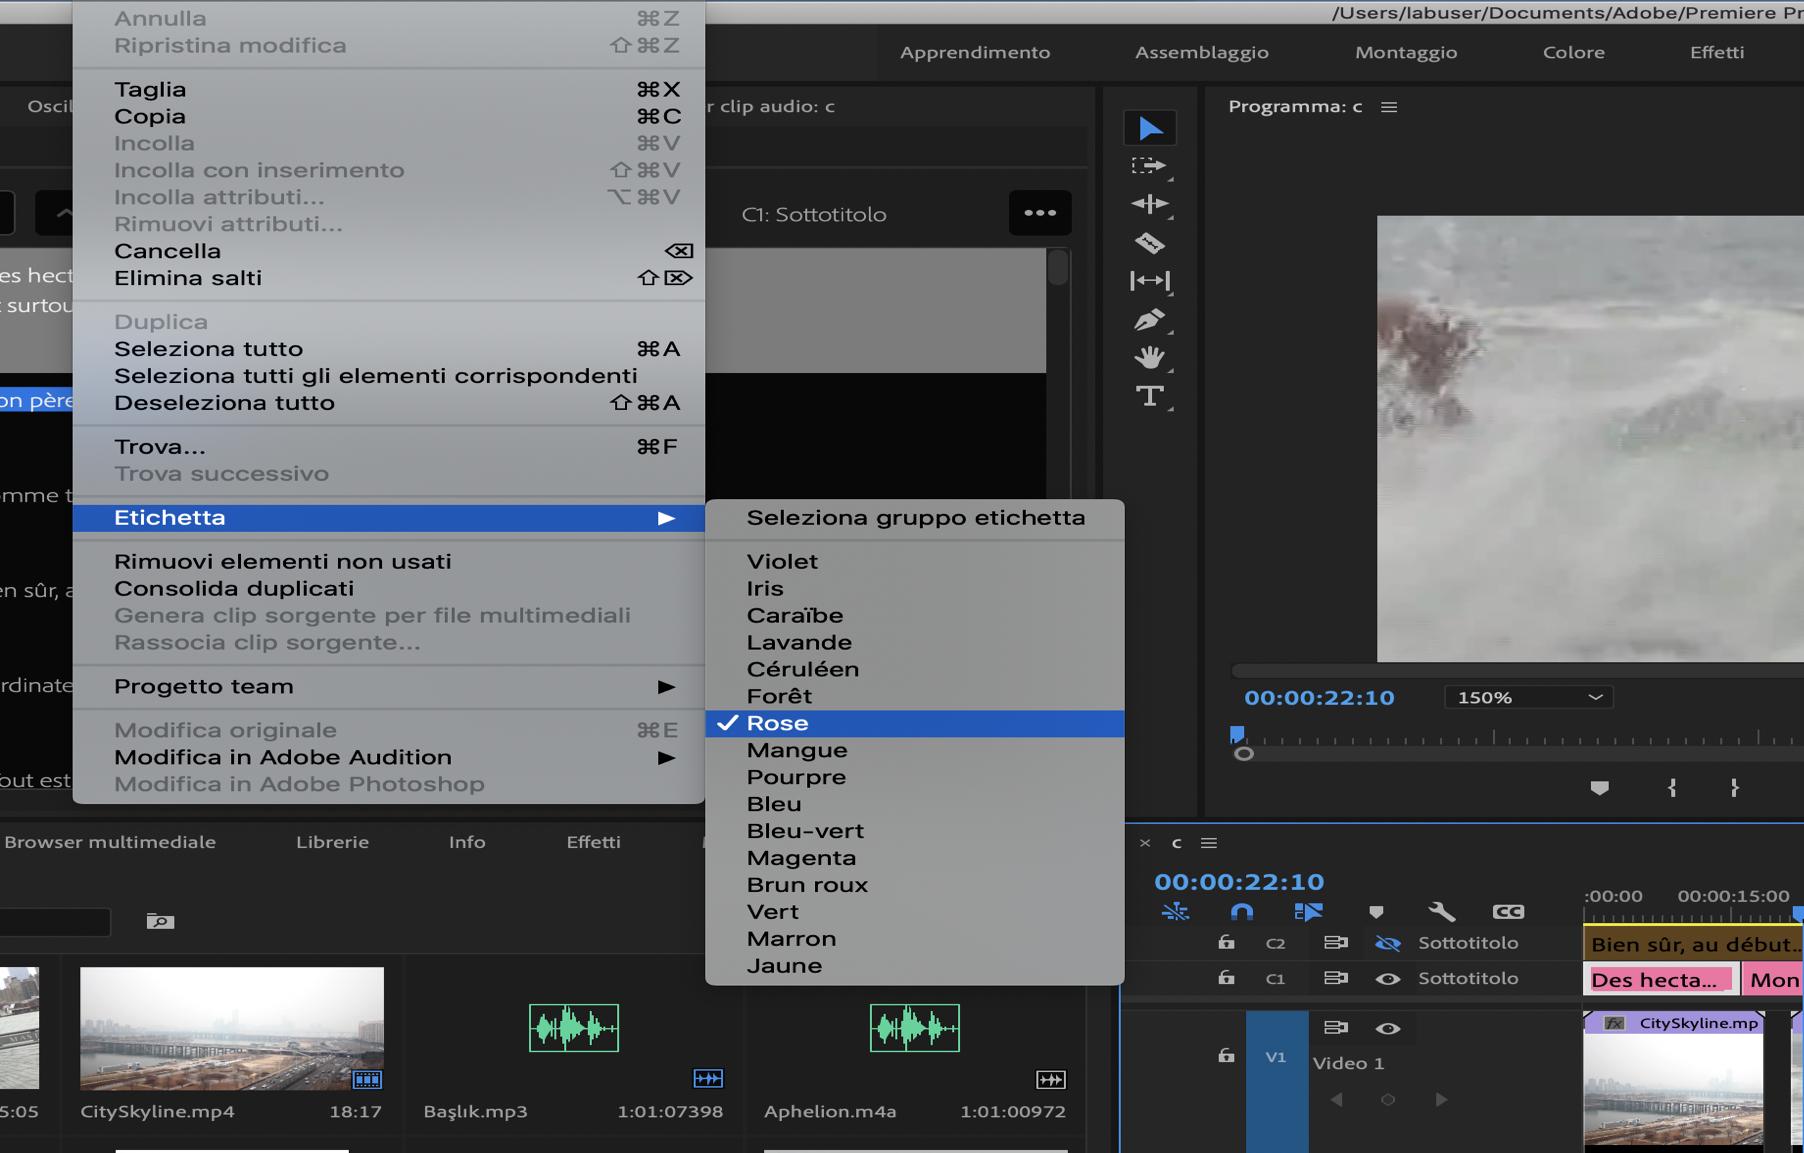 Setting label colors to caption items adobe premiere pro crack 2021